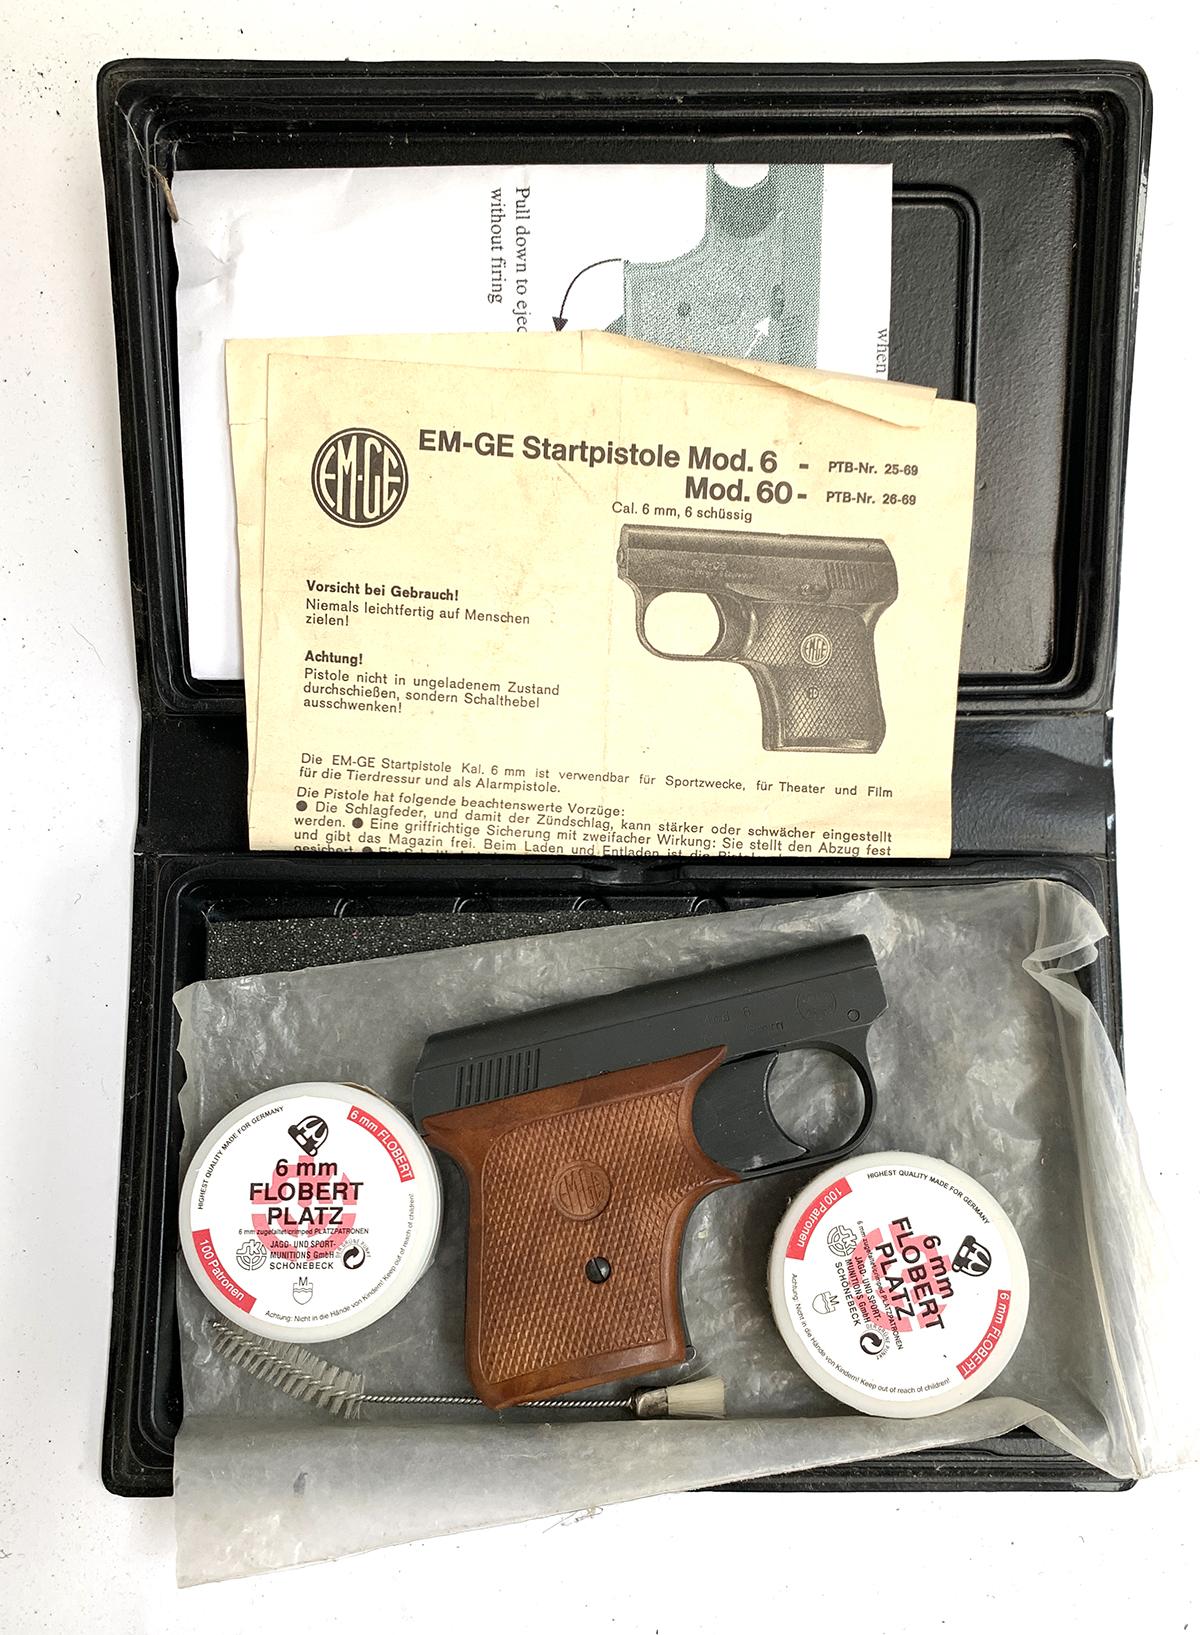 A German EM-GE starter pistol by Gerstenberger u. Eberwein, model 6, with blank cartridges, etc